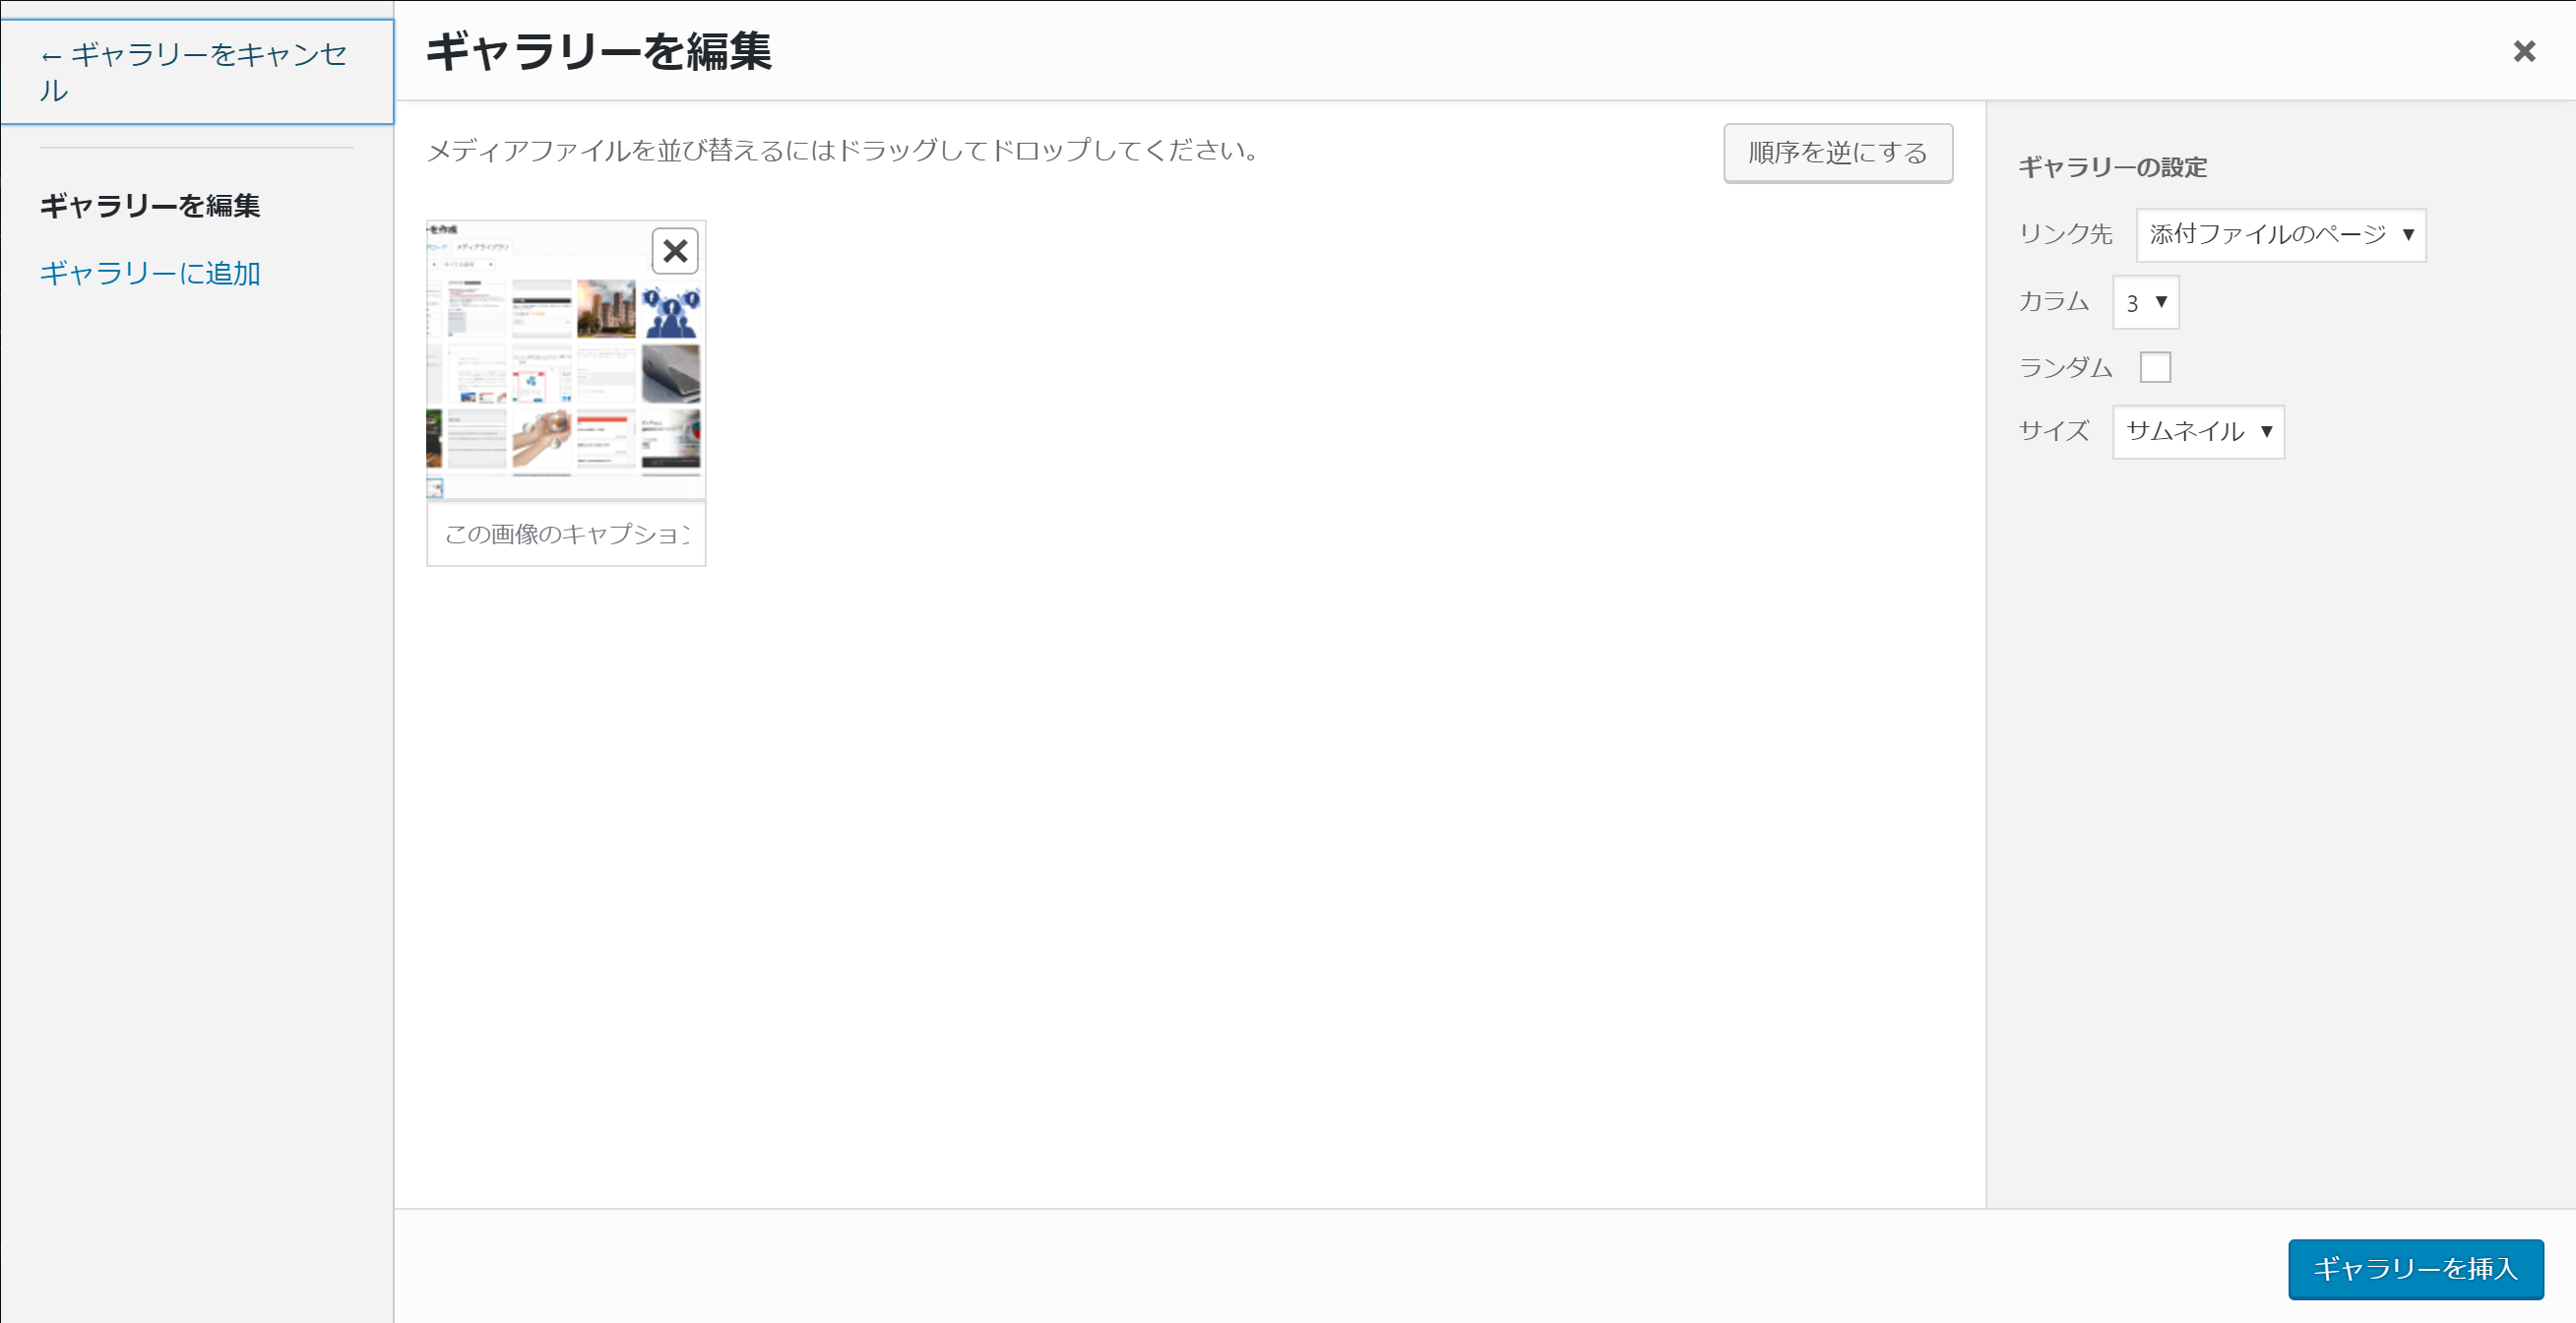 gallery custom - WordPressのギャラリー機能とは?関連プラグイン12選(日本語対応あり)